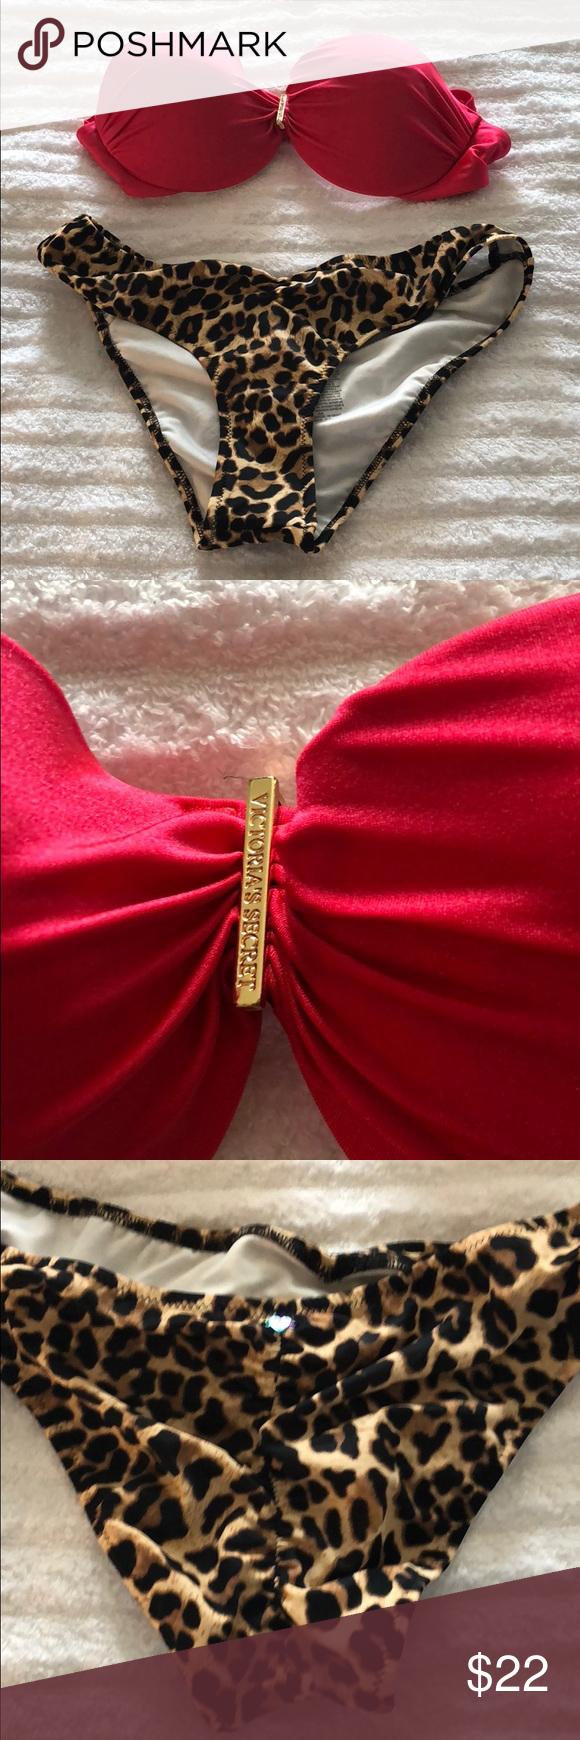 Victoria's Secret mismatched bikini Beautiful mismatched red and leopard bikin…